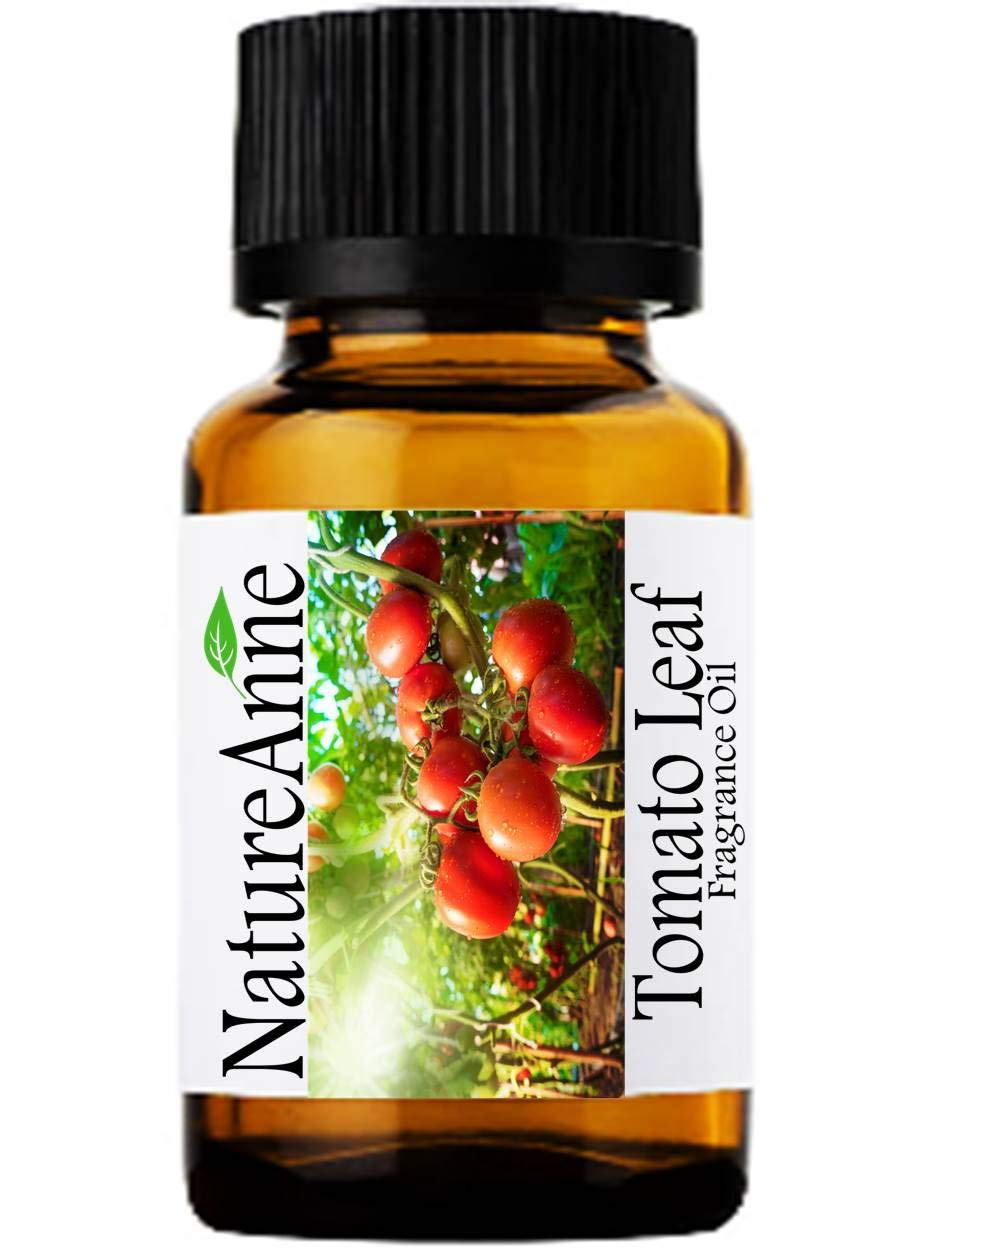 Tomato Leaf Premium Grade Fragrance Oil